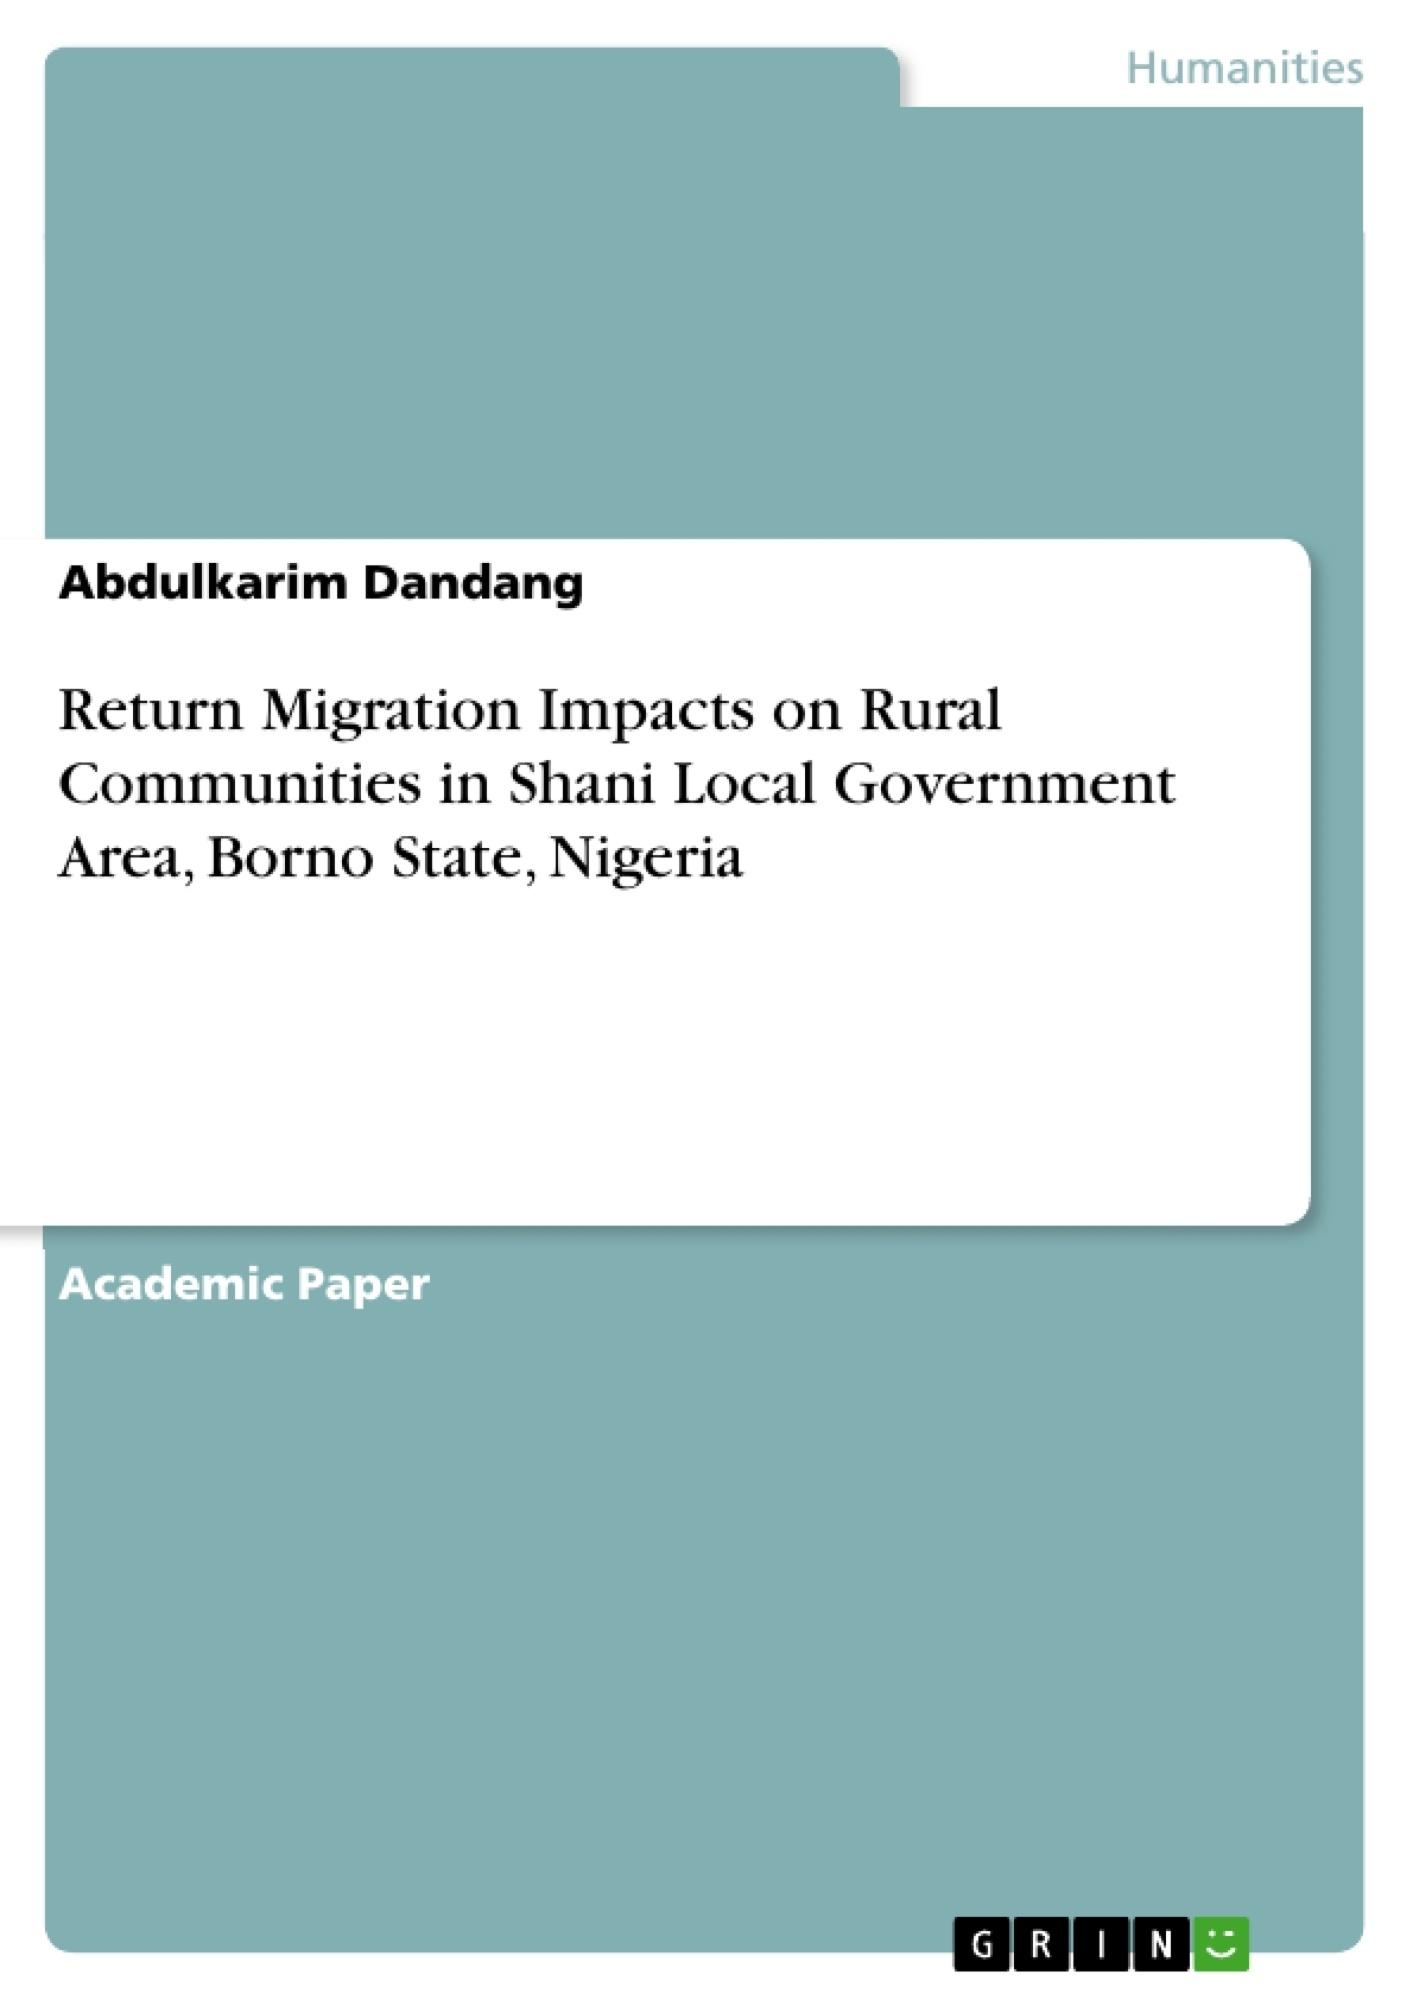 Title: Return Migration Impacts on Rural Communities in Shani Local Government Area, Borno State, Nigeria